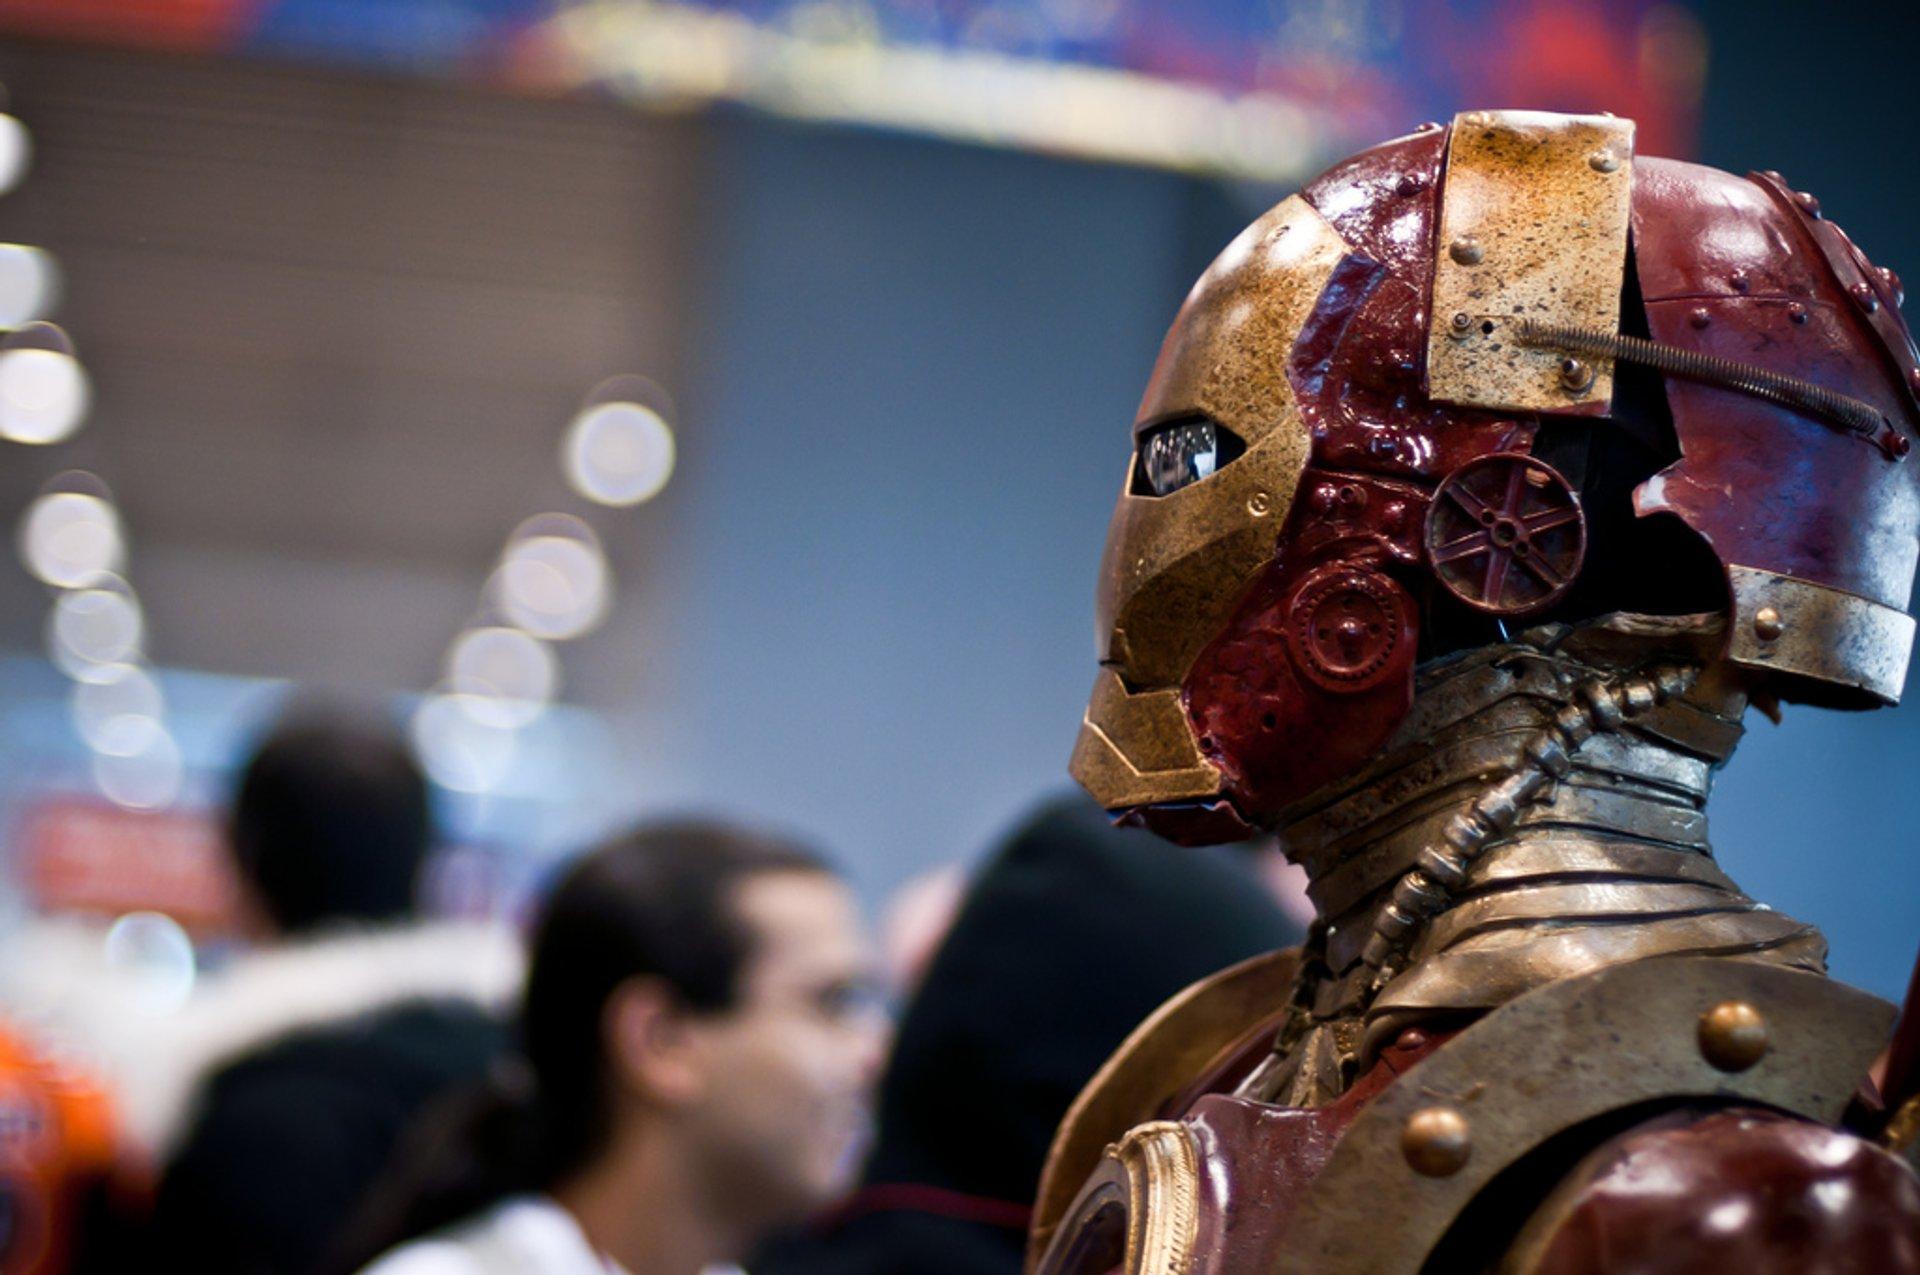 New York Comic Con in New York - Best Season 2020